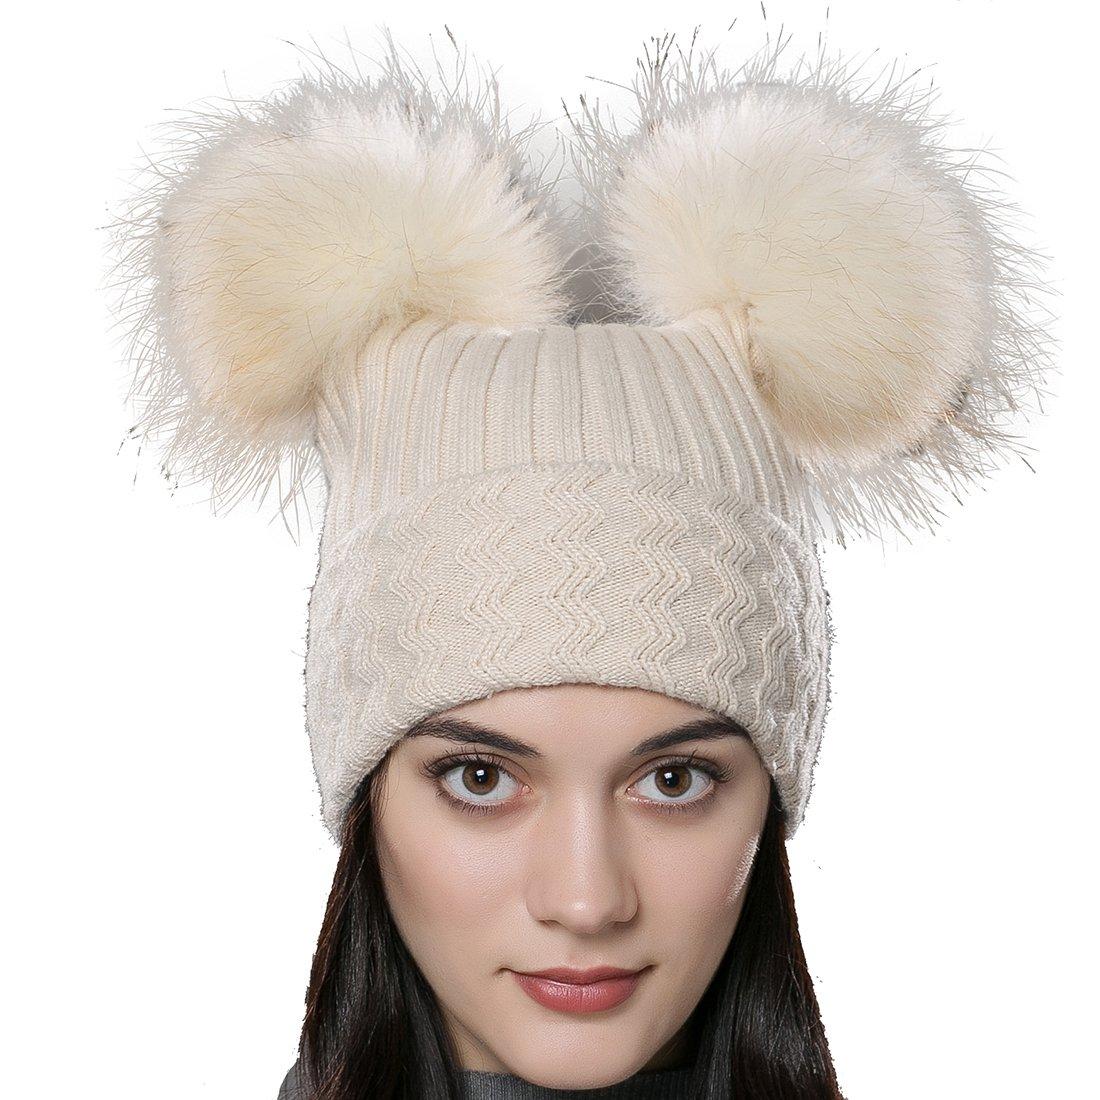 URSFUR Unisex Autumn Knit Wool Beanie Hat Women Winter Hat with Fur Ball  Pom Pom at Amazon Women s Clothing store  2cf95826825